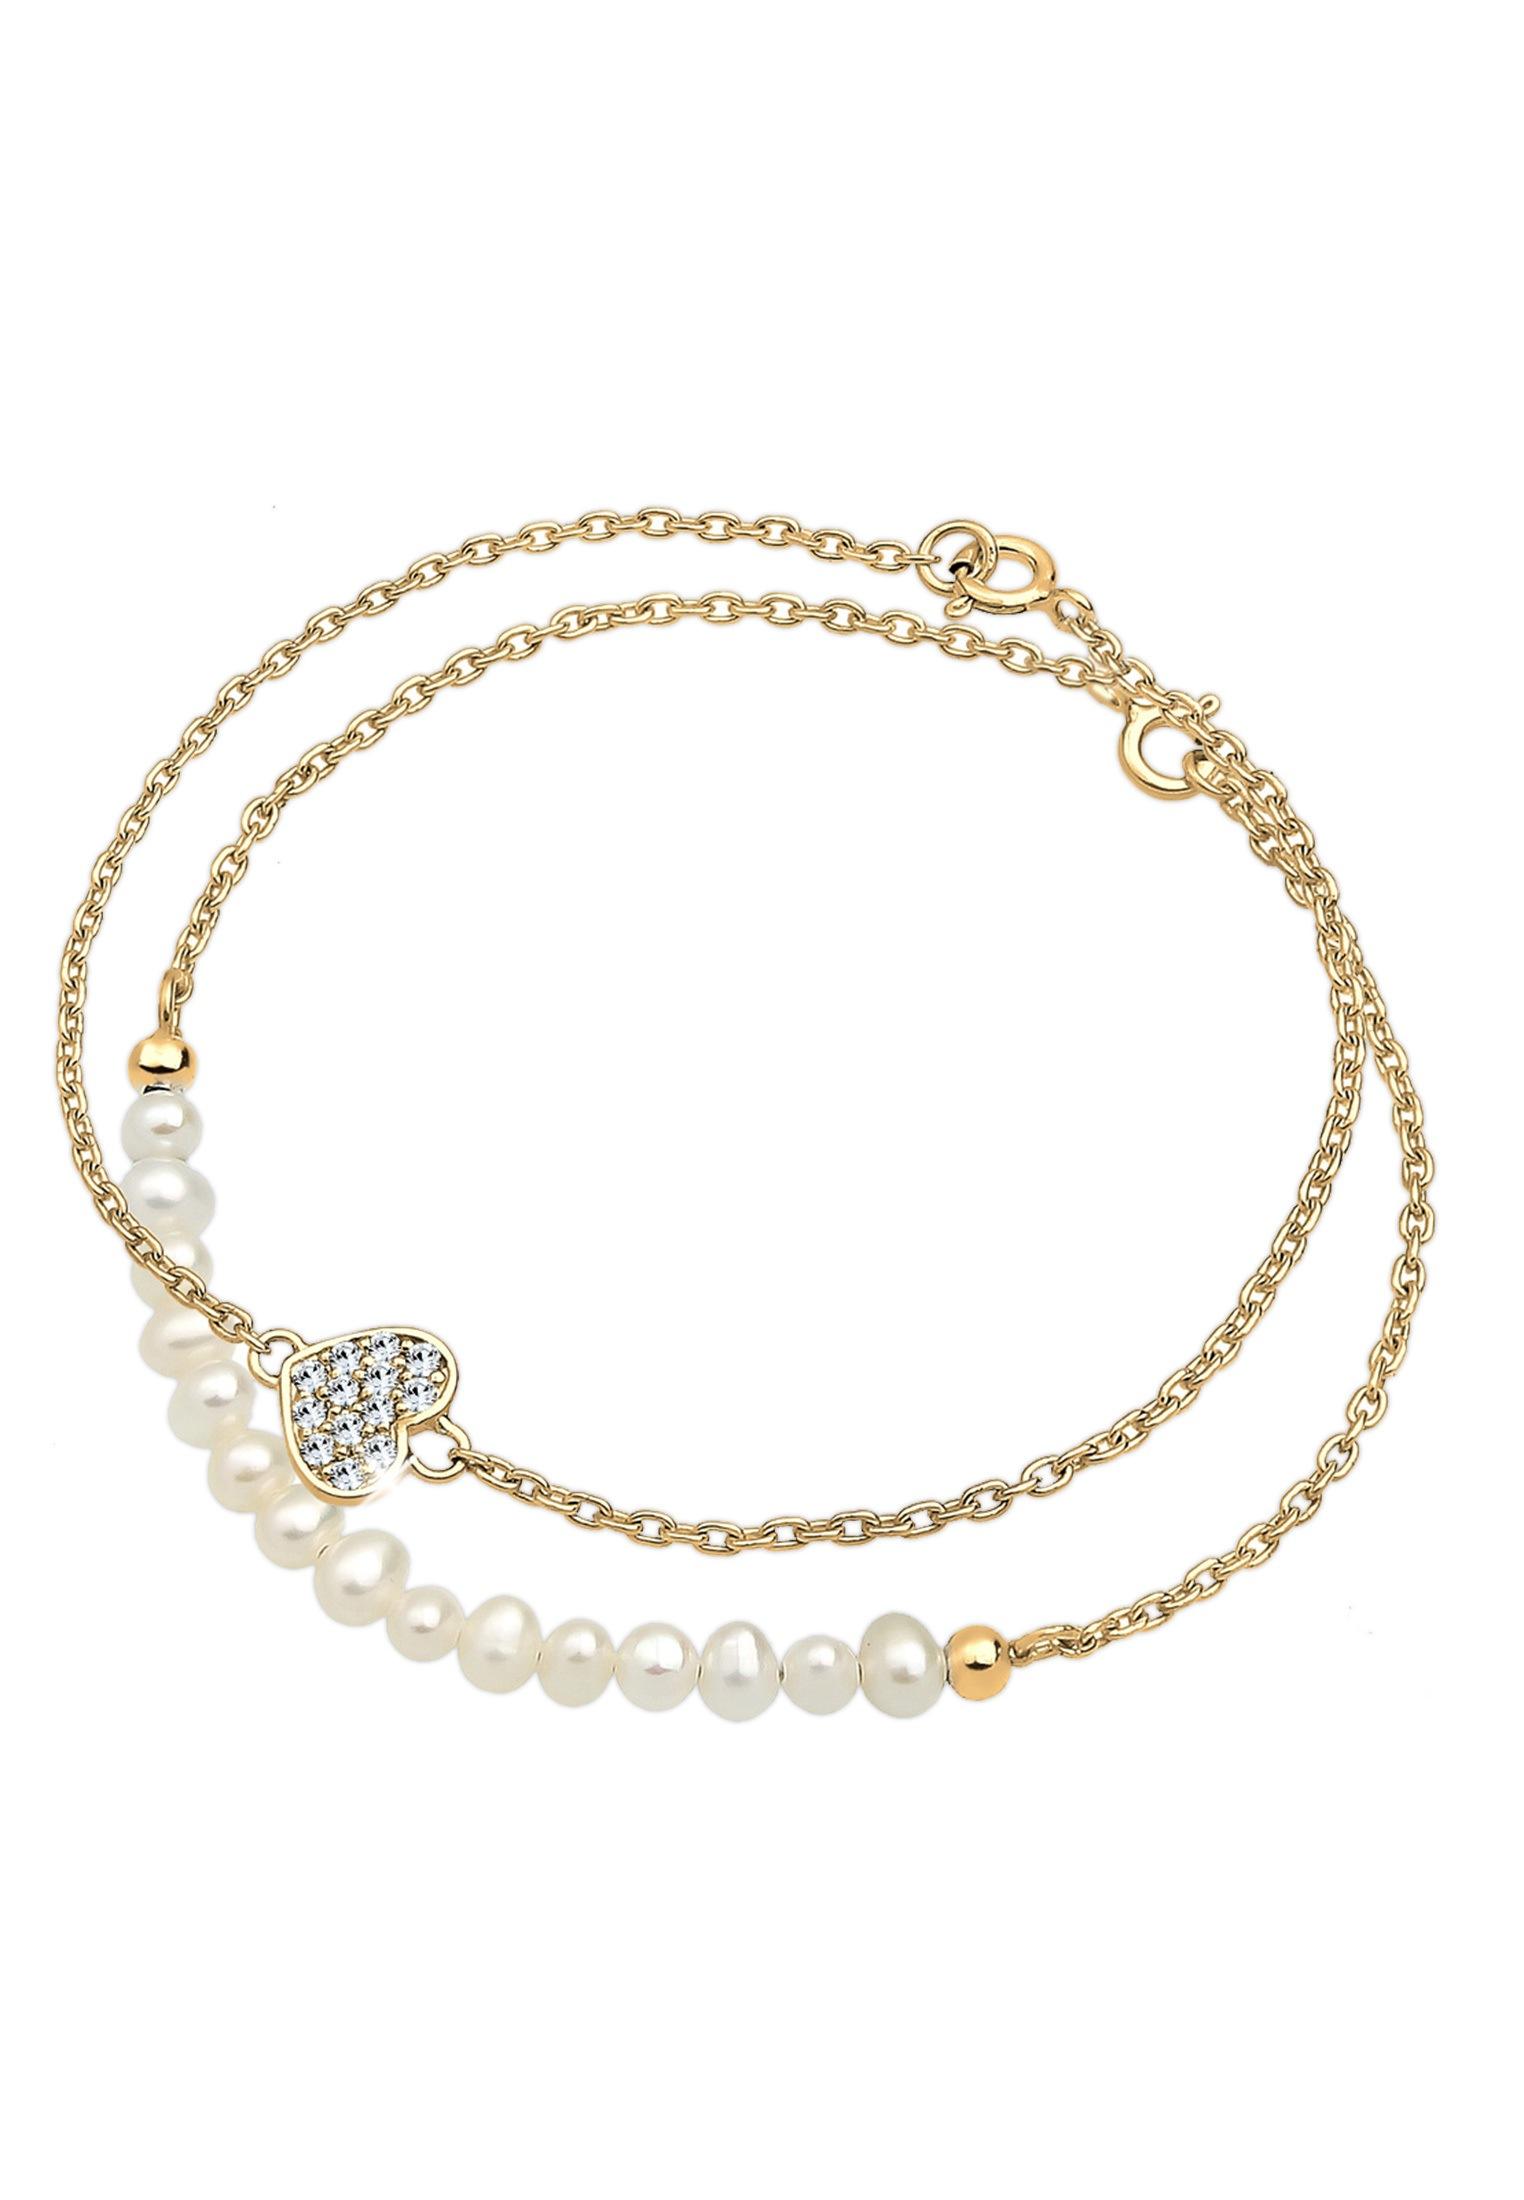 Elli Perlenarmband Set Herz Layer Swarovski Kristalle Cute 925 Silber   Schmuck > Armbänder > Perlenarmbänder   Elli